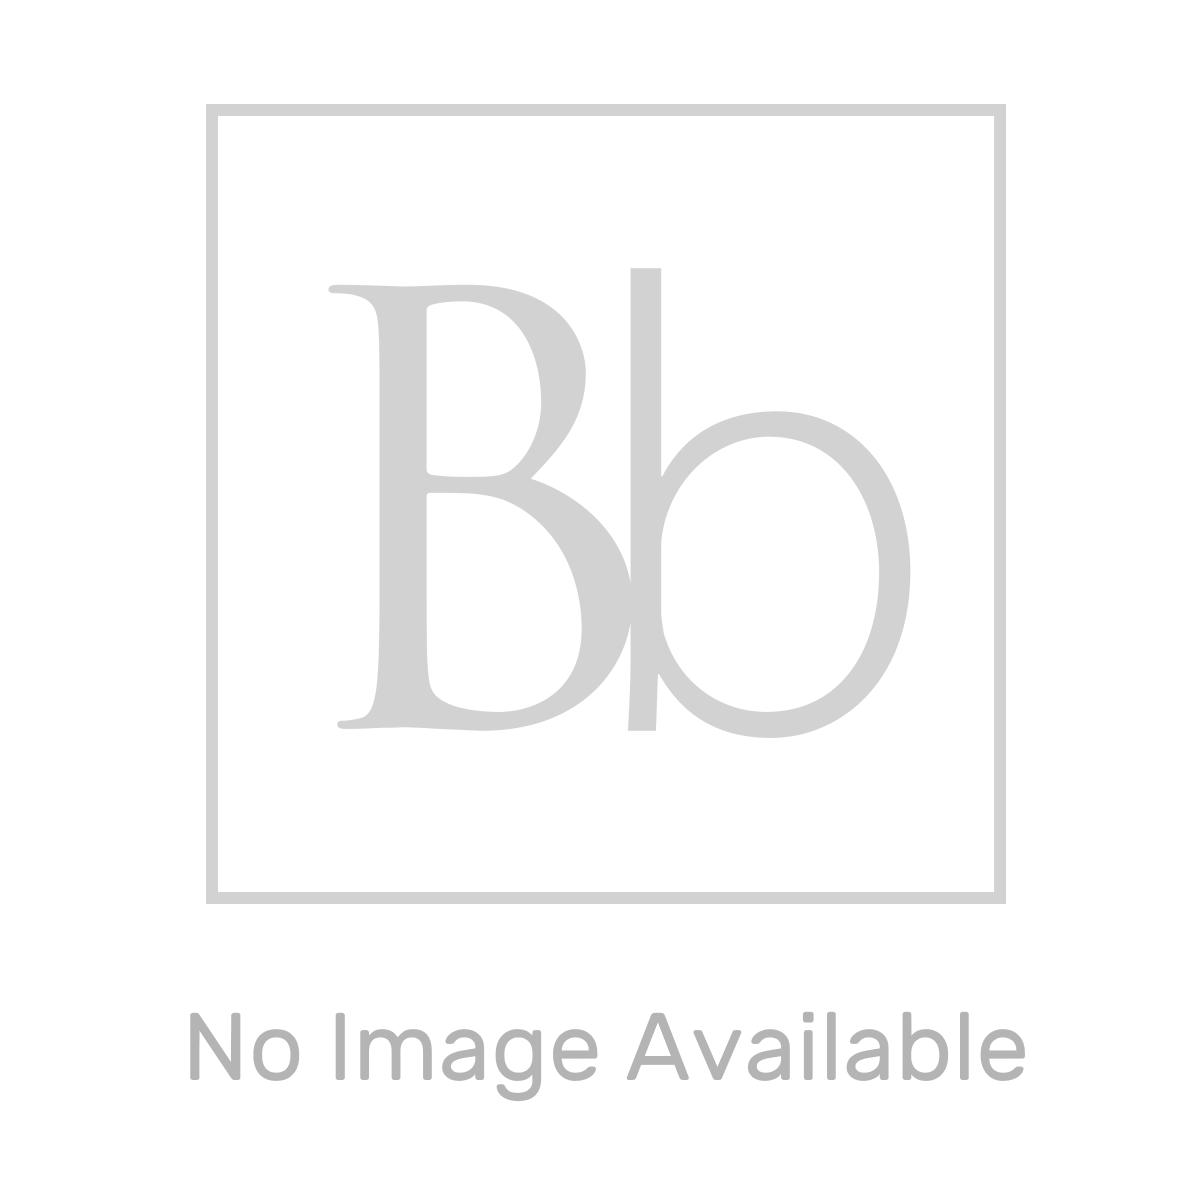 Moods Volta White Gloss End Panel 700mm